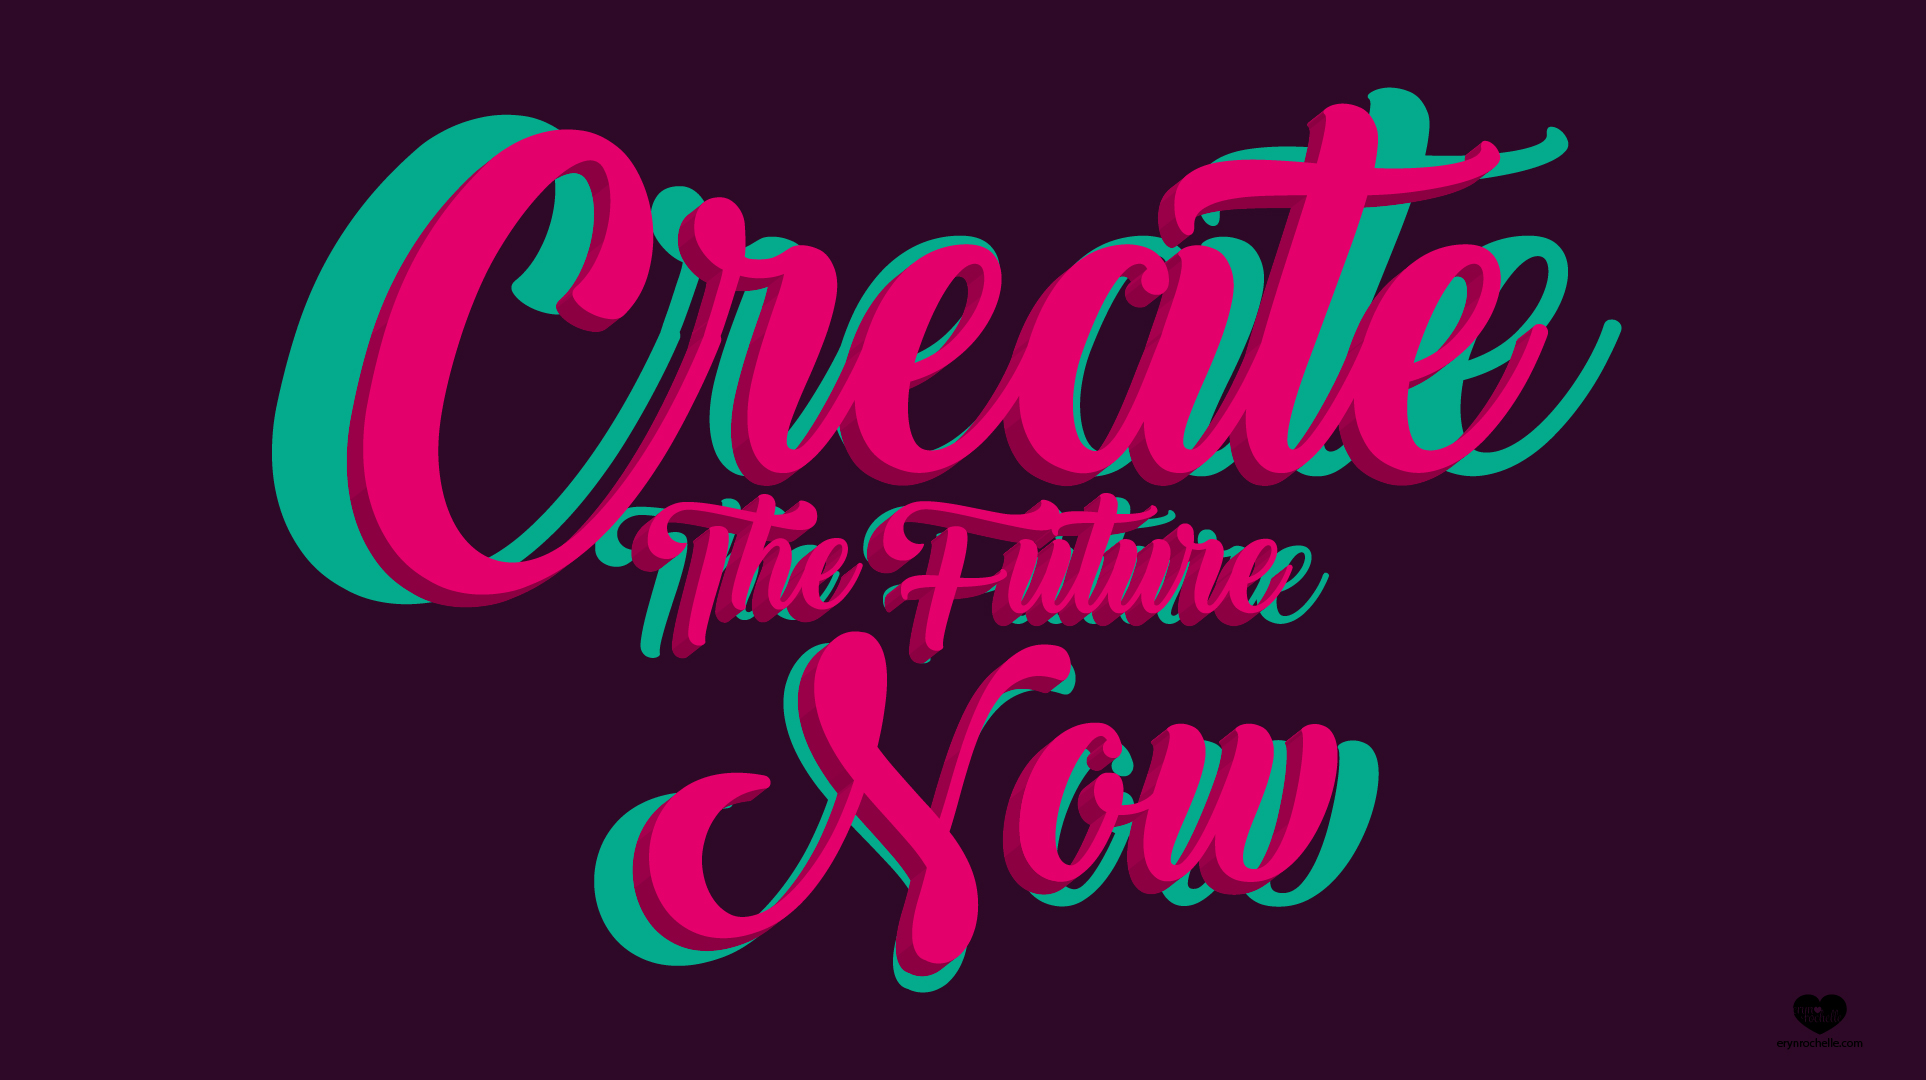 Create The Future Now